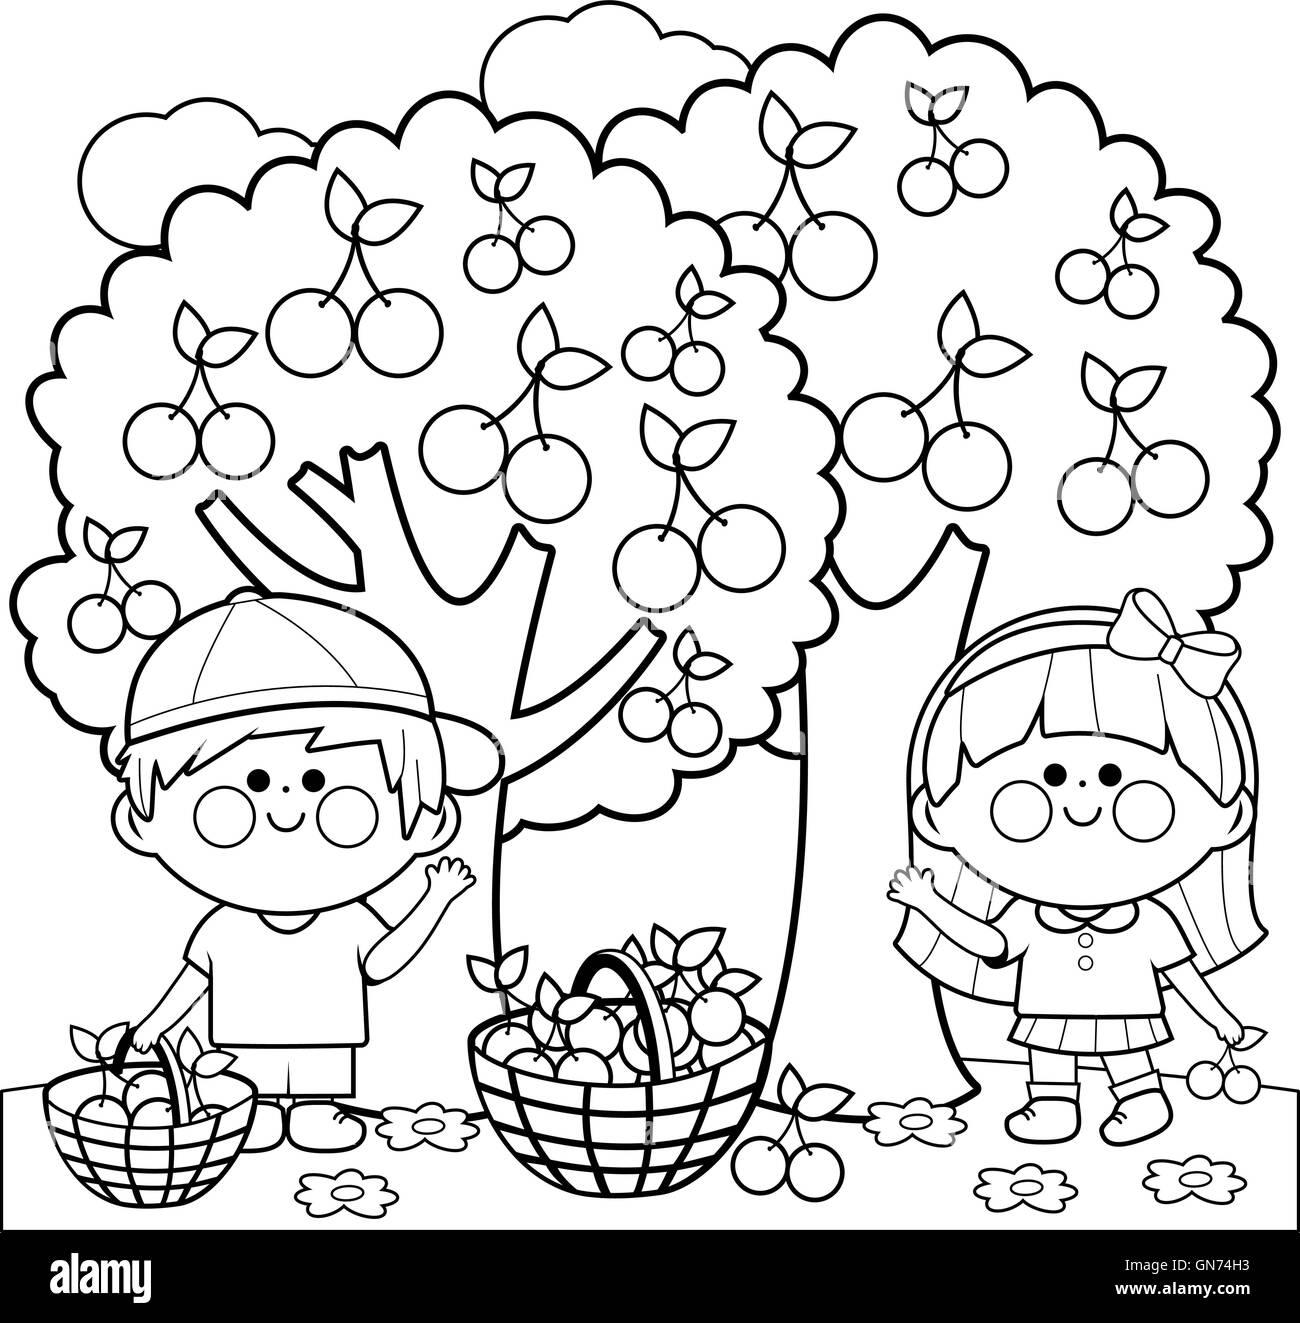 Coloring Book Kids Grass Flowers Stockfotos & Coloring Book Kids ...